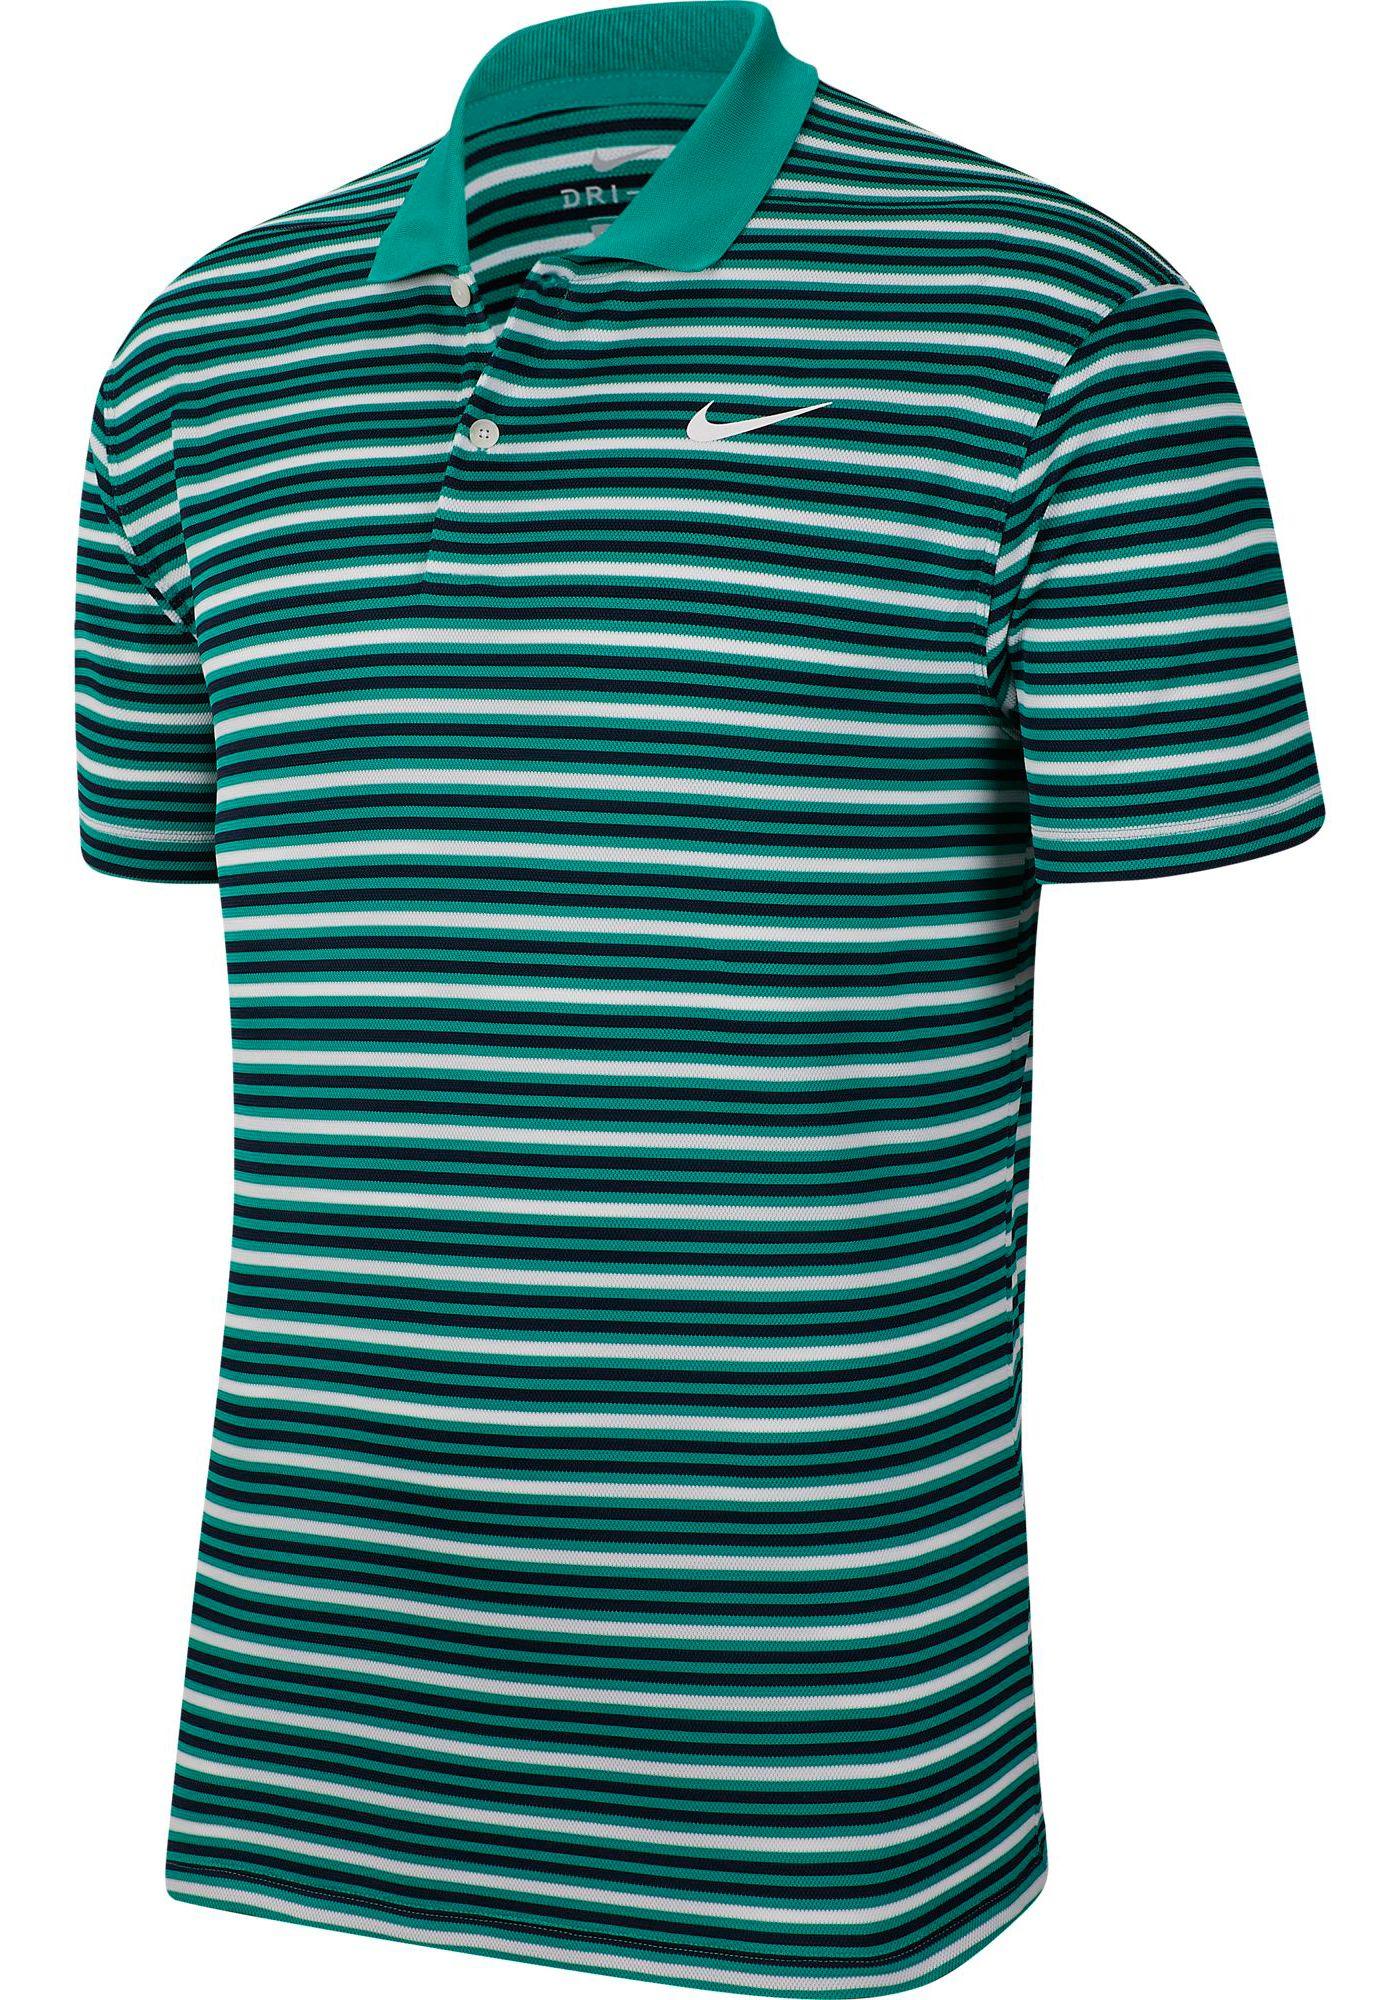 Nike Men's Dri-FIT Victory Striped Golf Polo